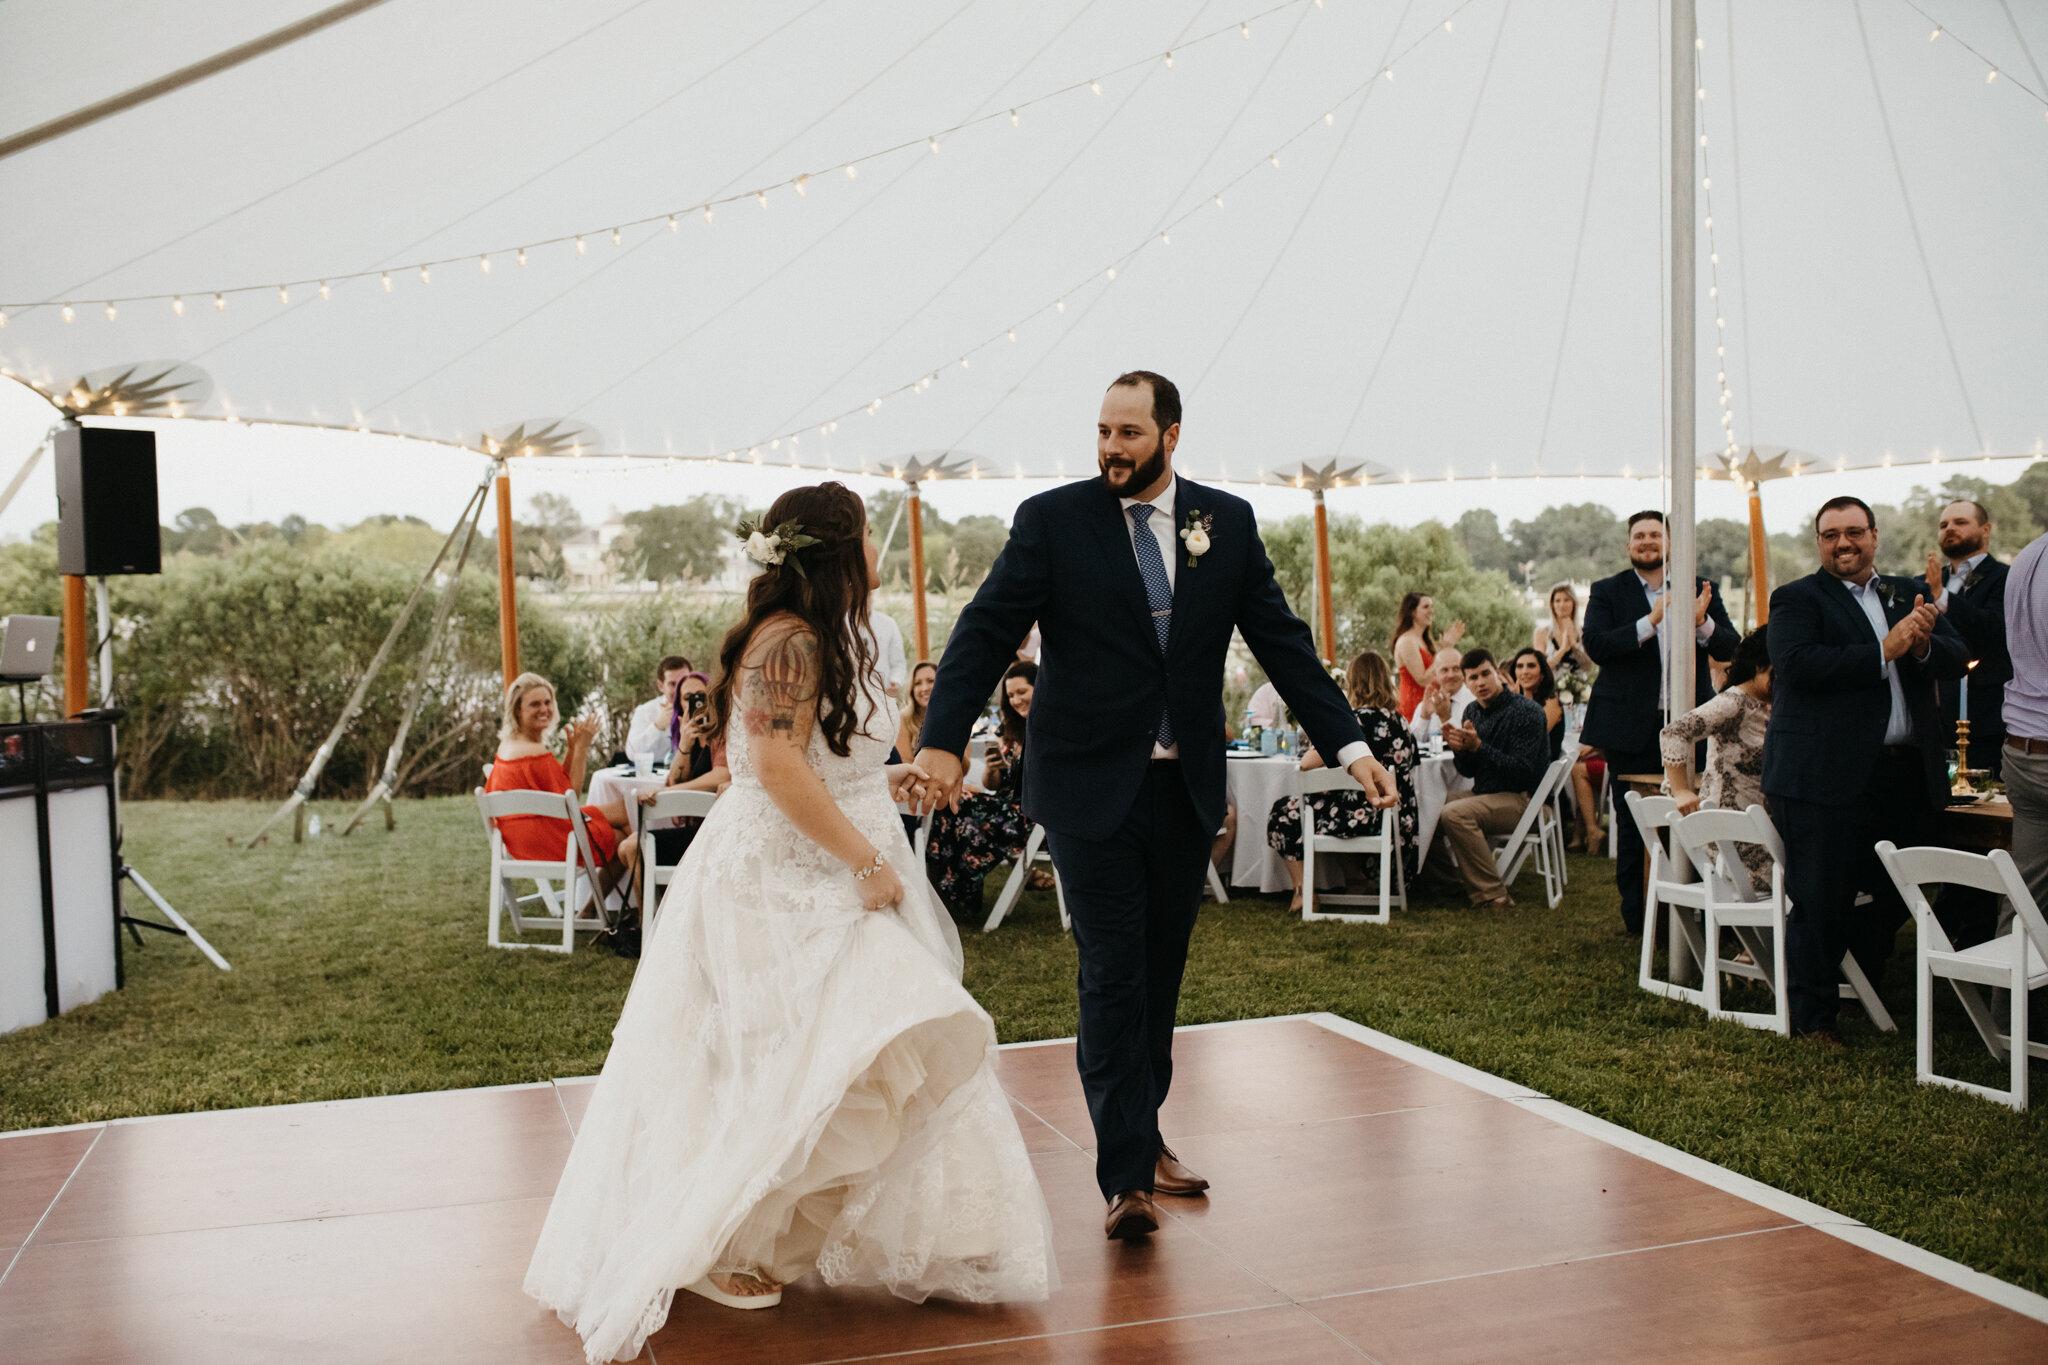 angela_jason_norfolk_wedding-144.jpg